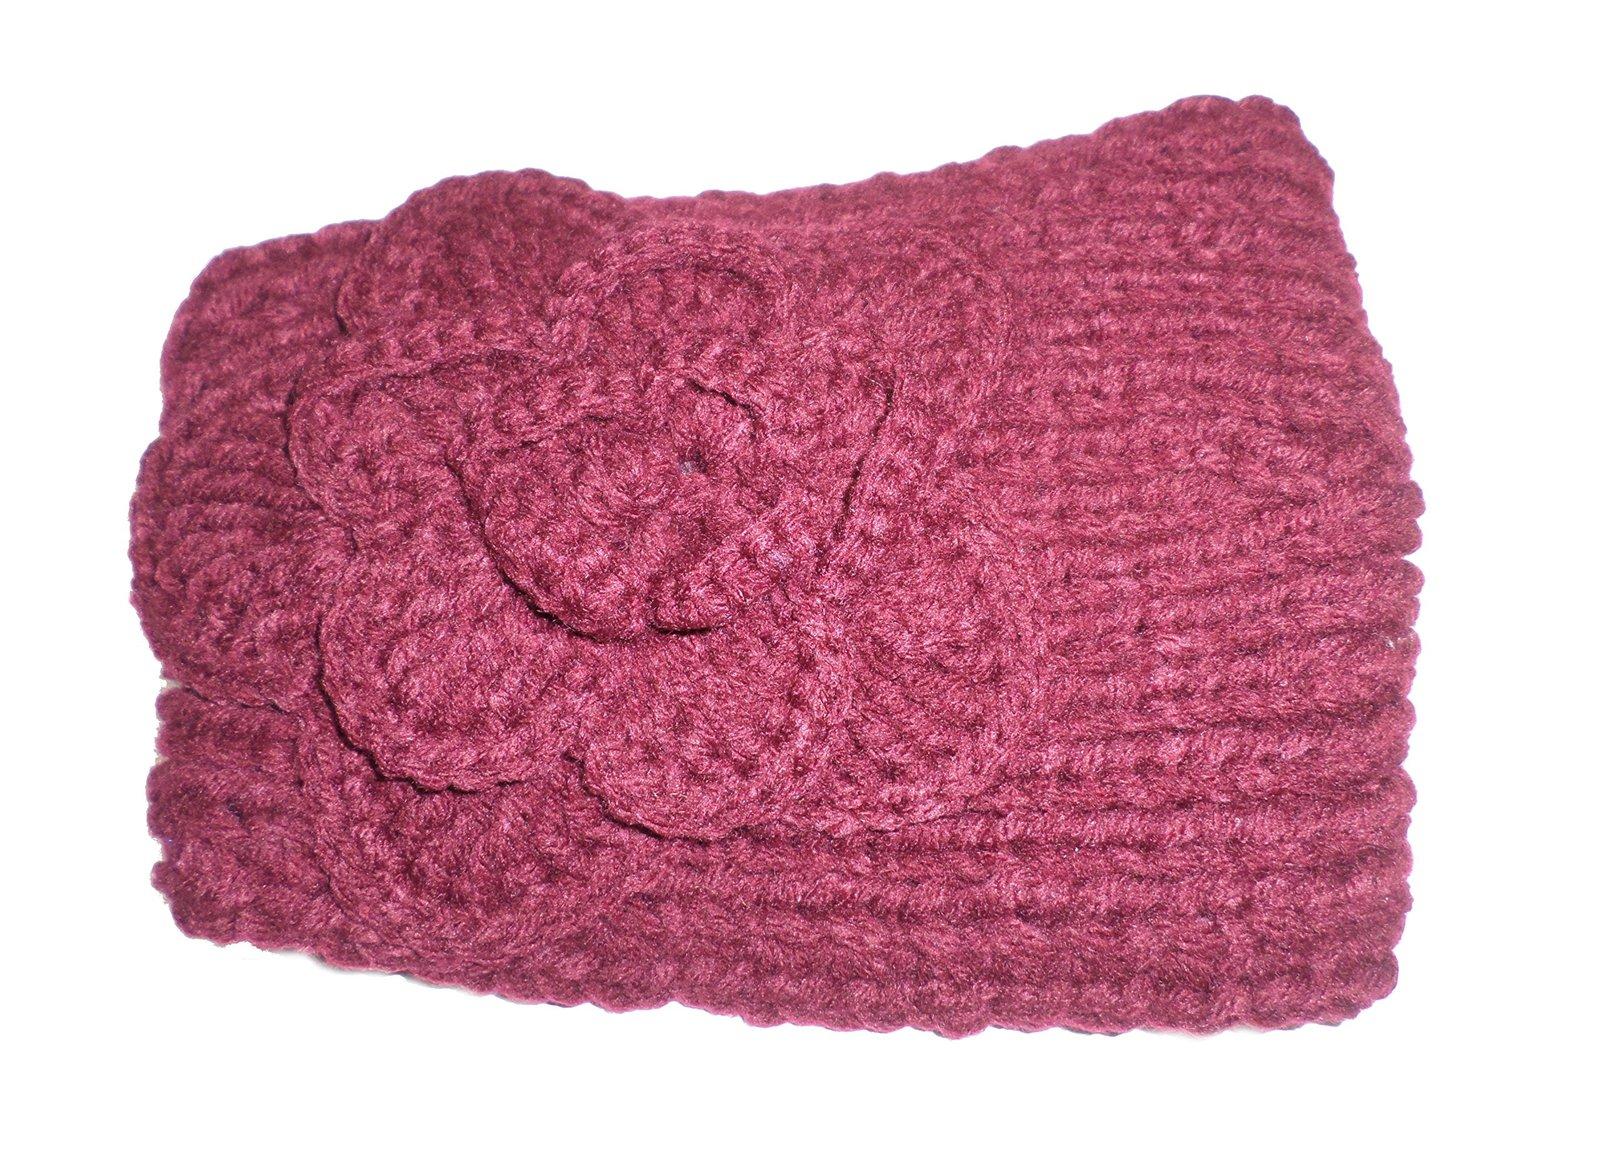 Knitted Crochet Flower Adjustable Button Stretch Headband ...